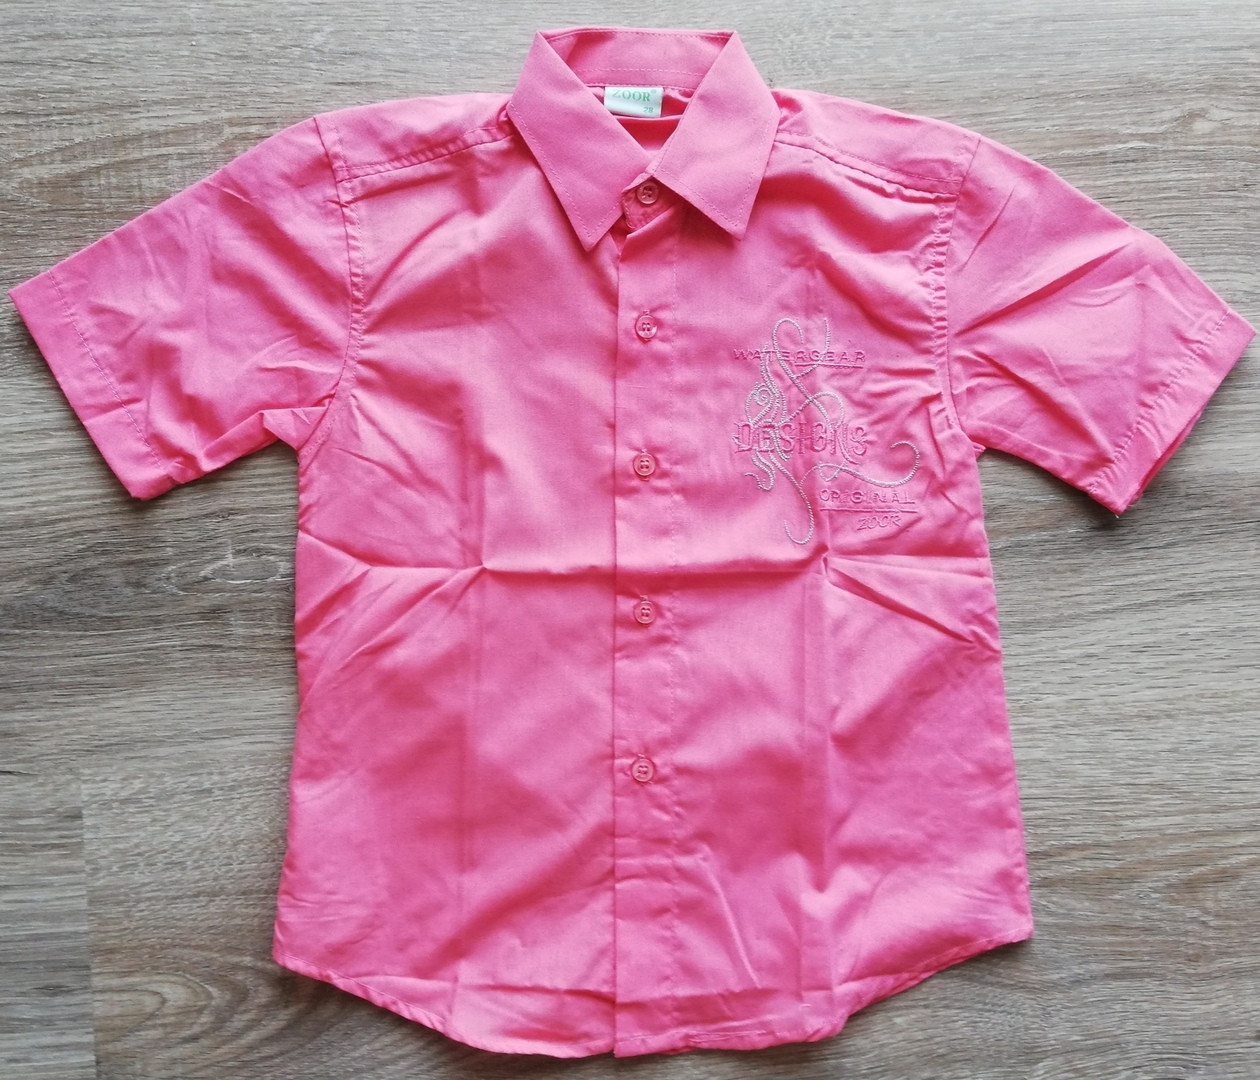 Детская рубашка с коротким рукавом Кораловая  30,31,32,34